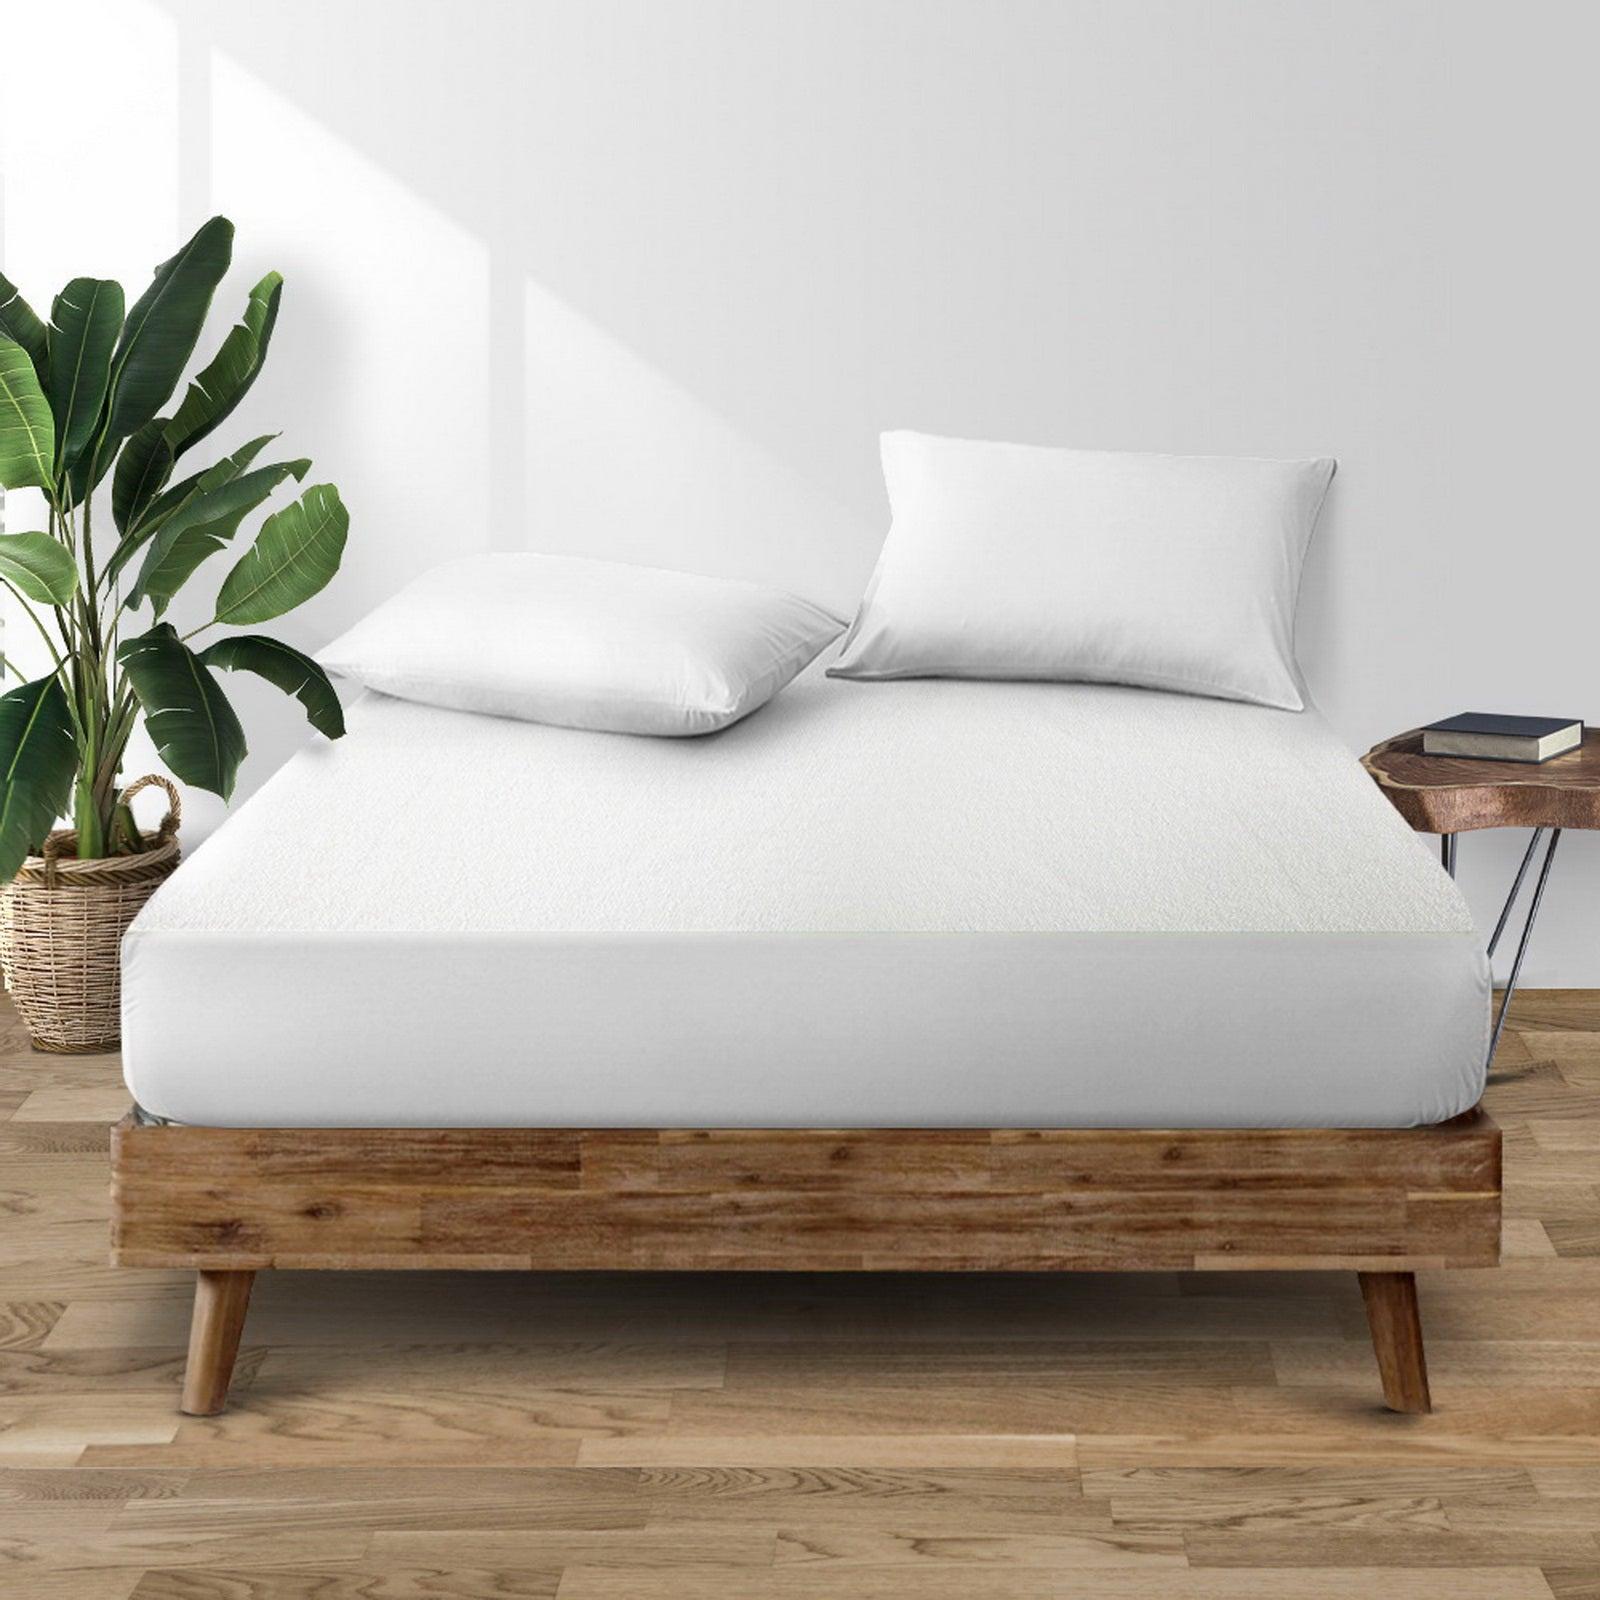 Giselle Bedding Mattress Protector Waterproof Bamboo Fiber